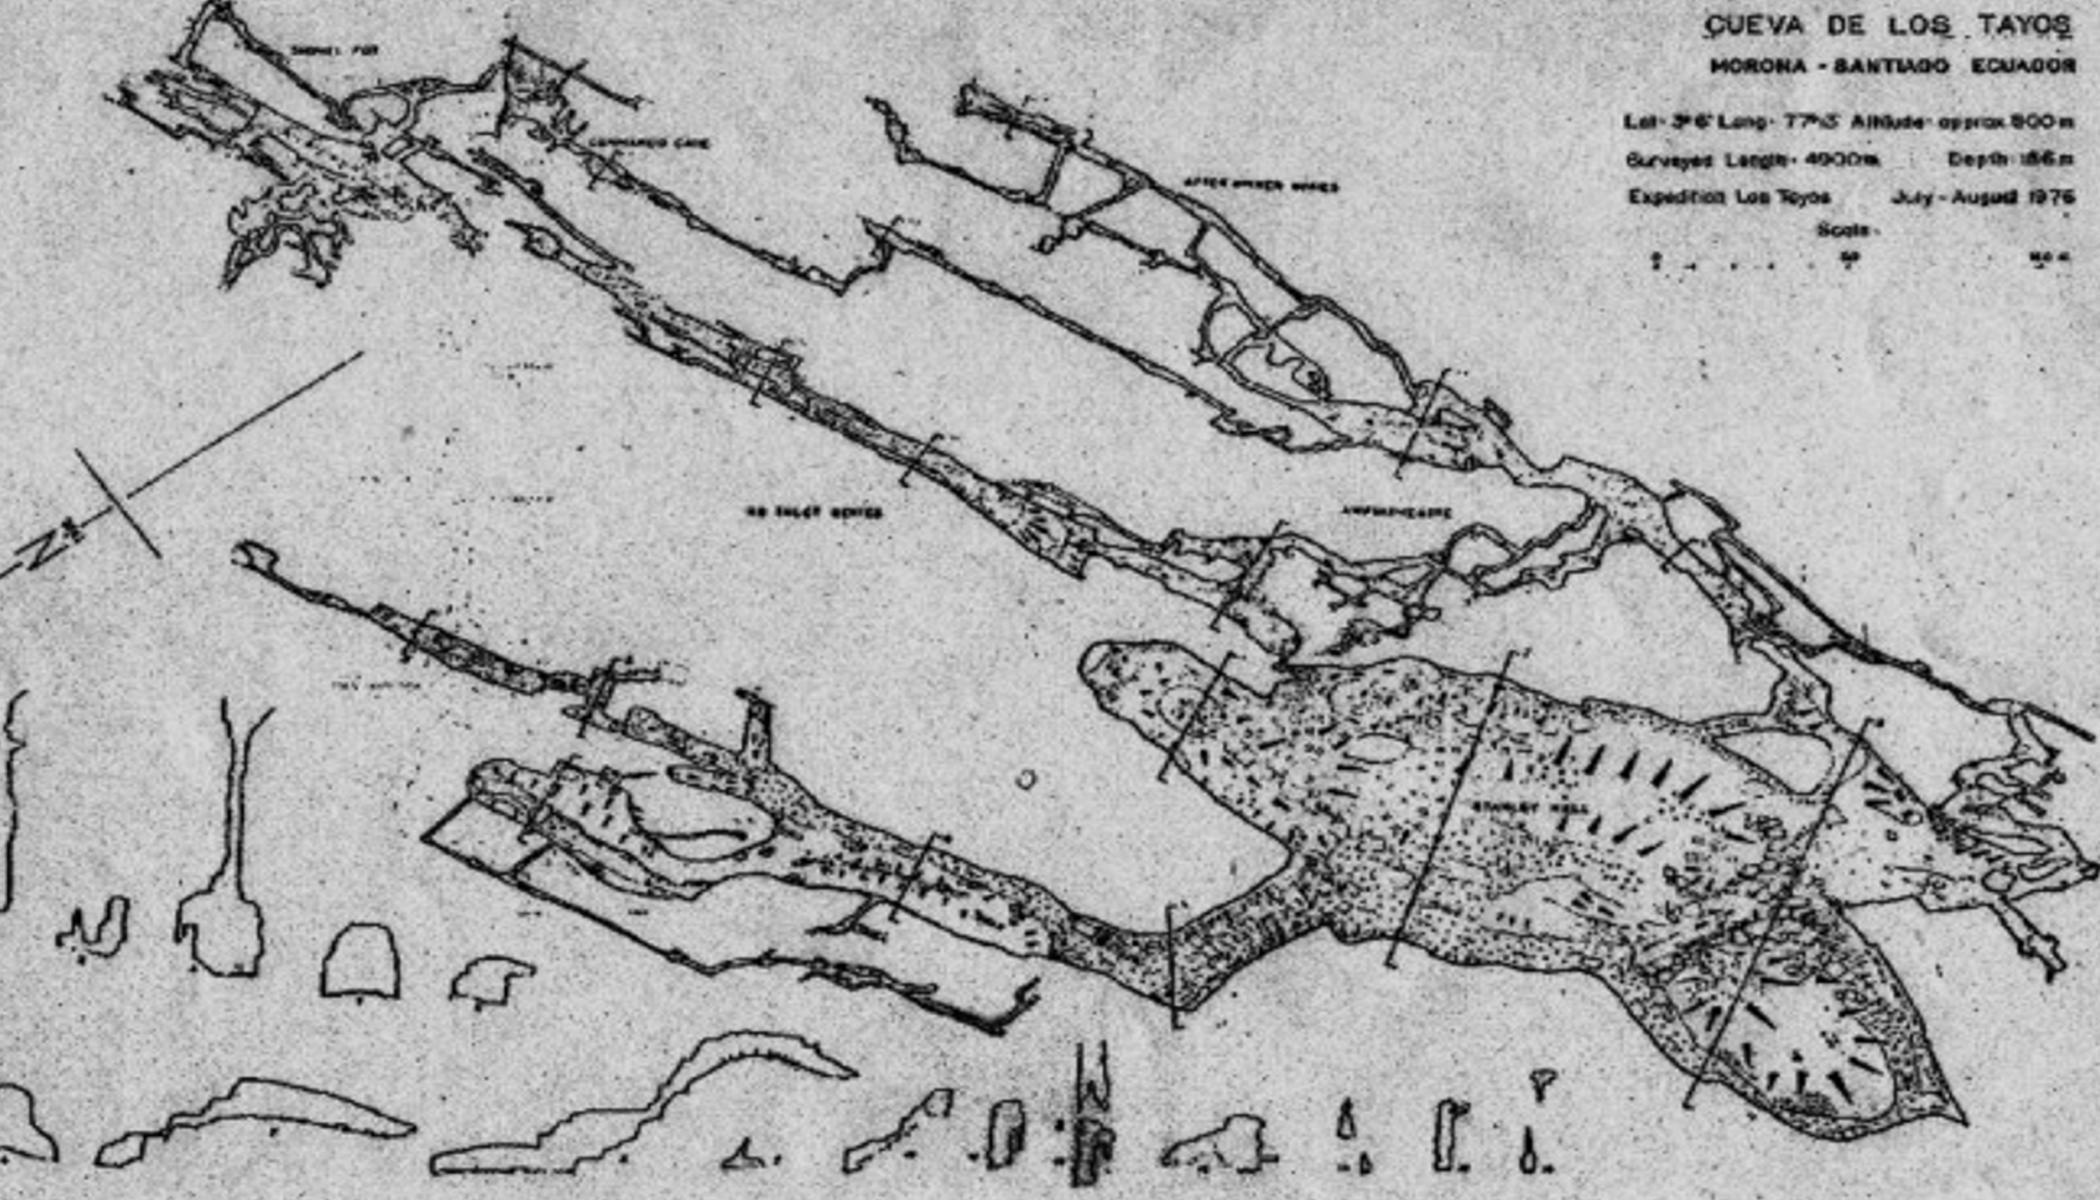 Tayos_cave_map_1976.JPG